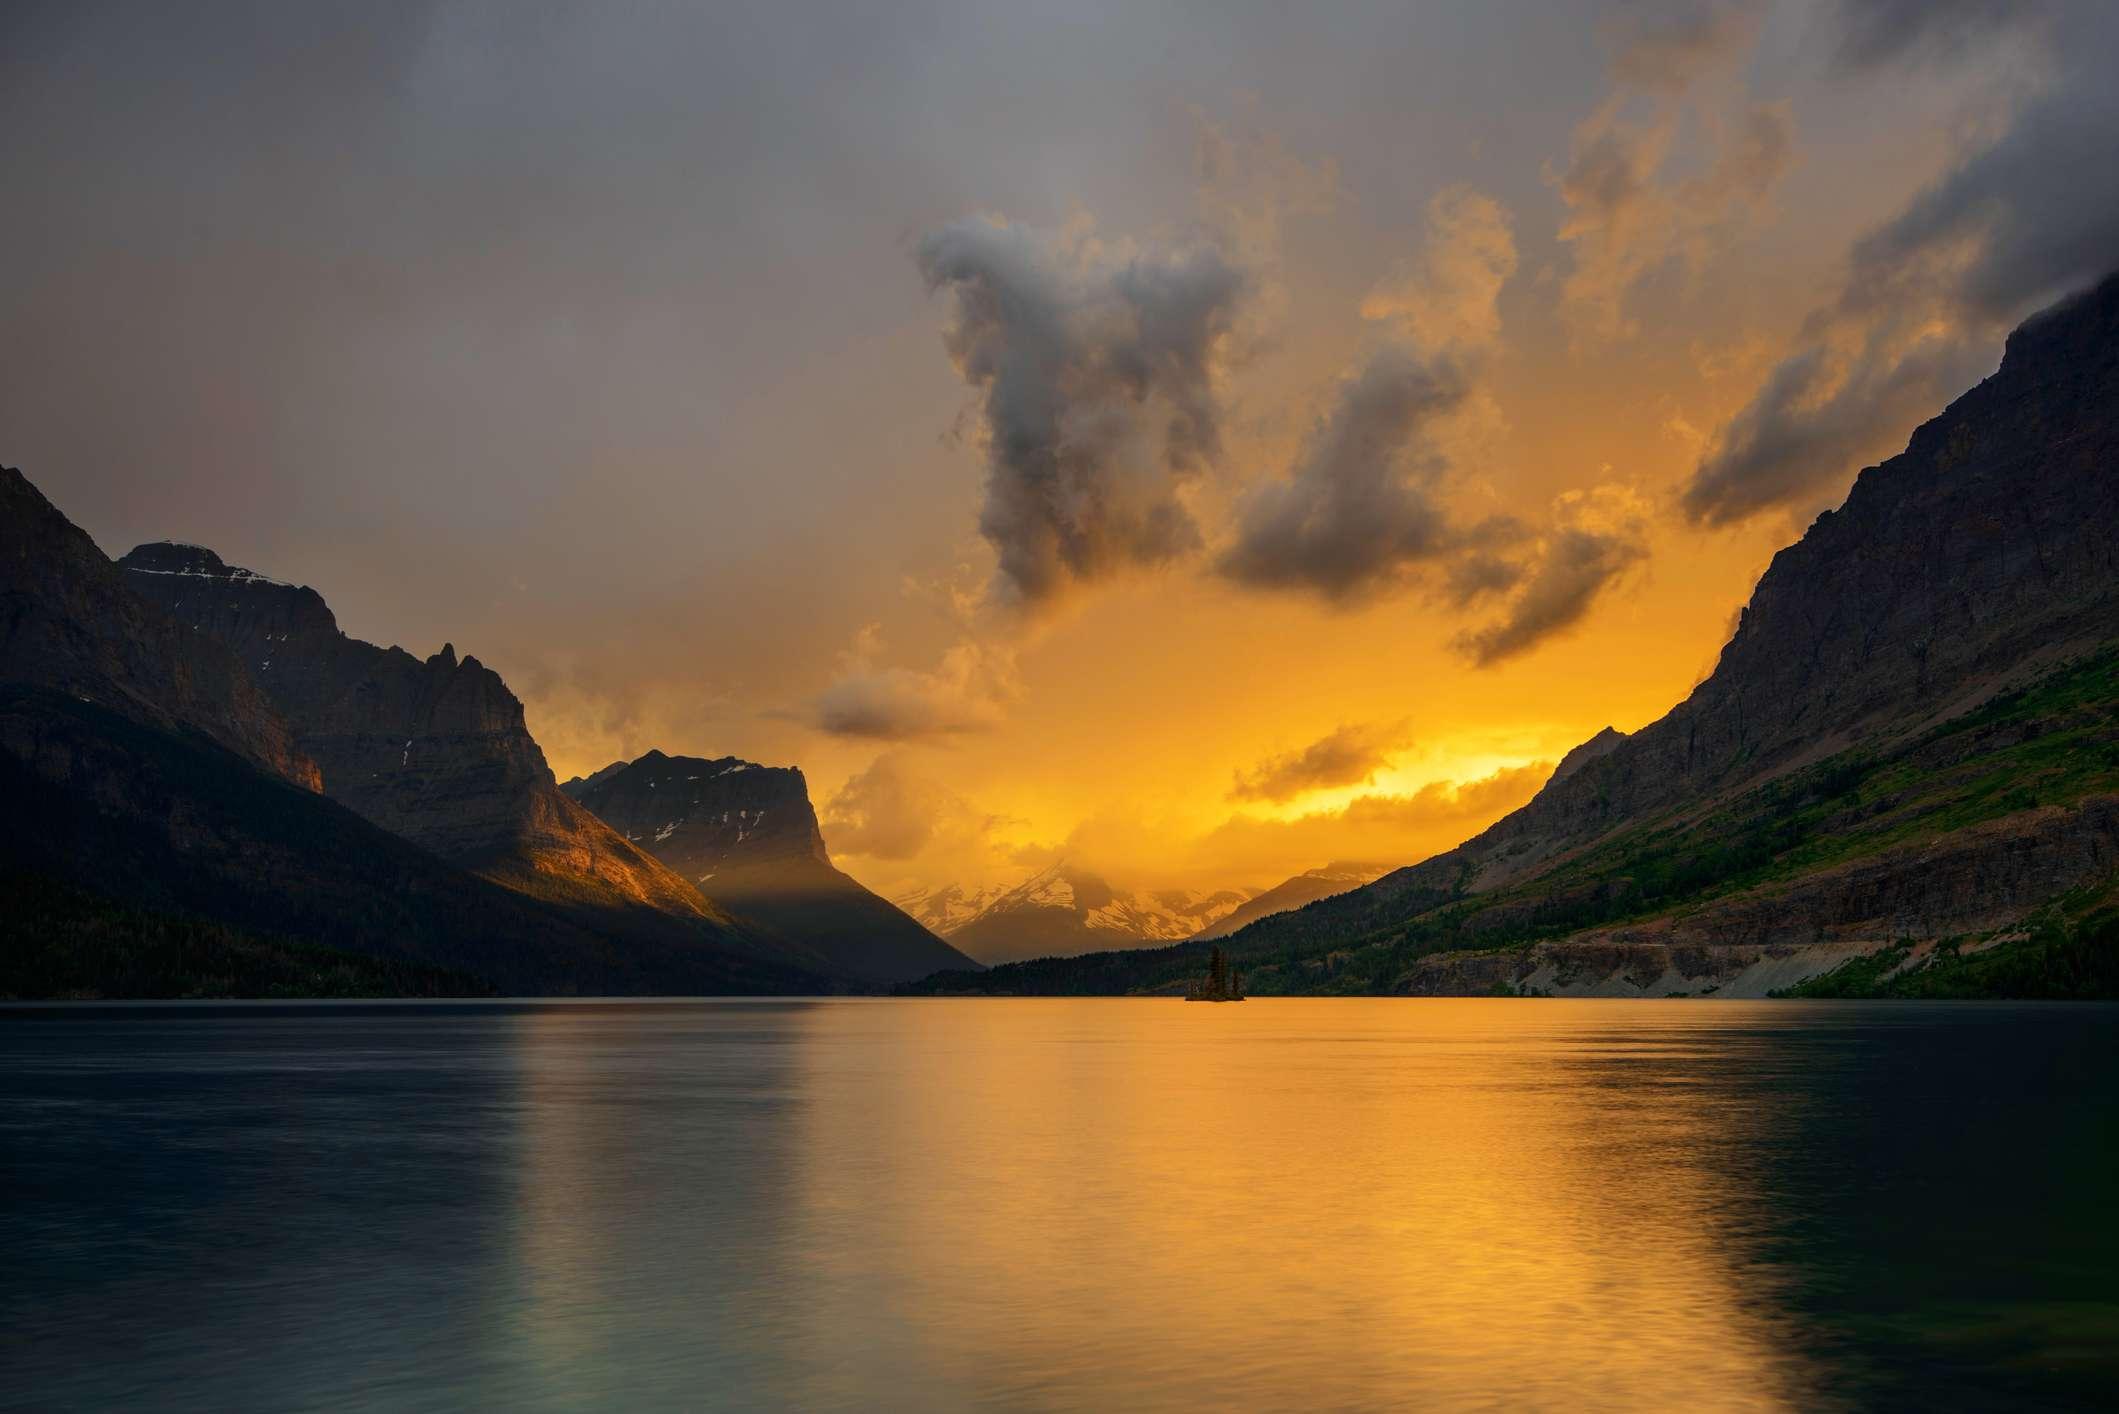 Sunset over Saint Mary Lake, Glacier National Park